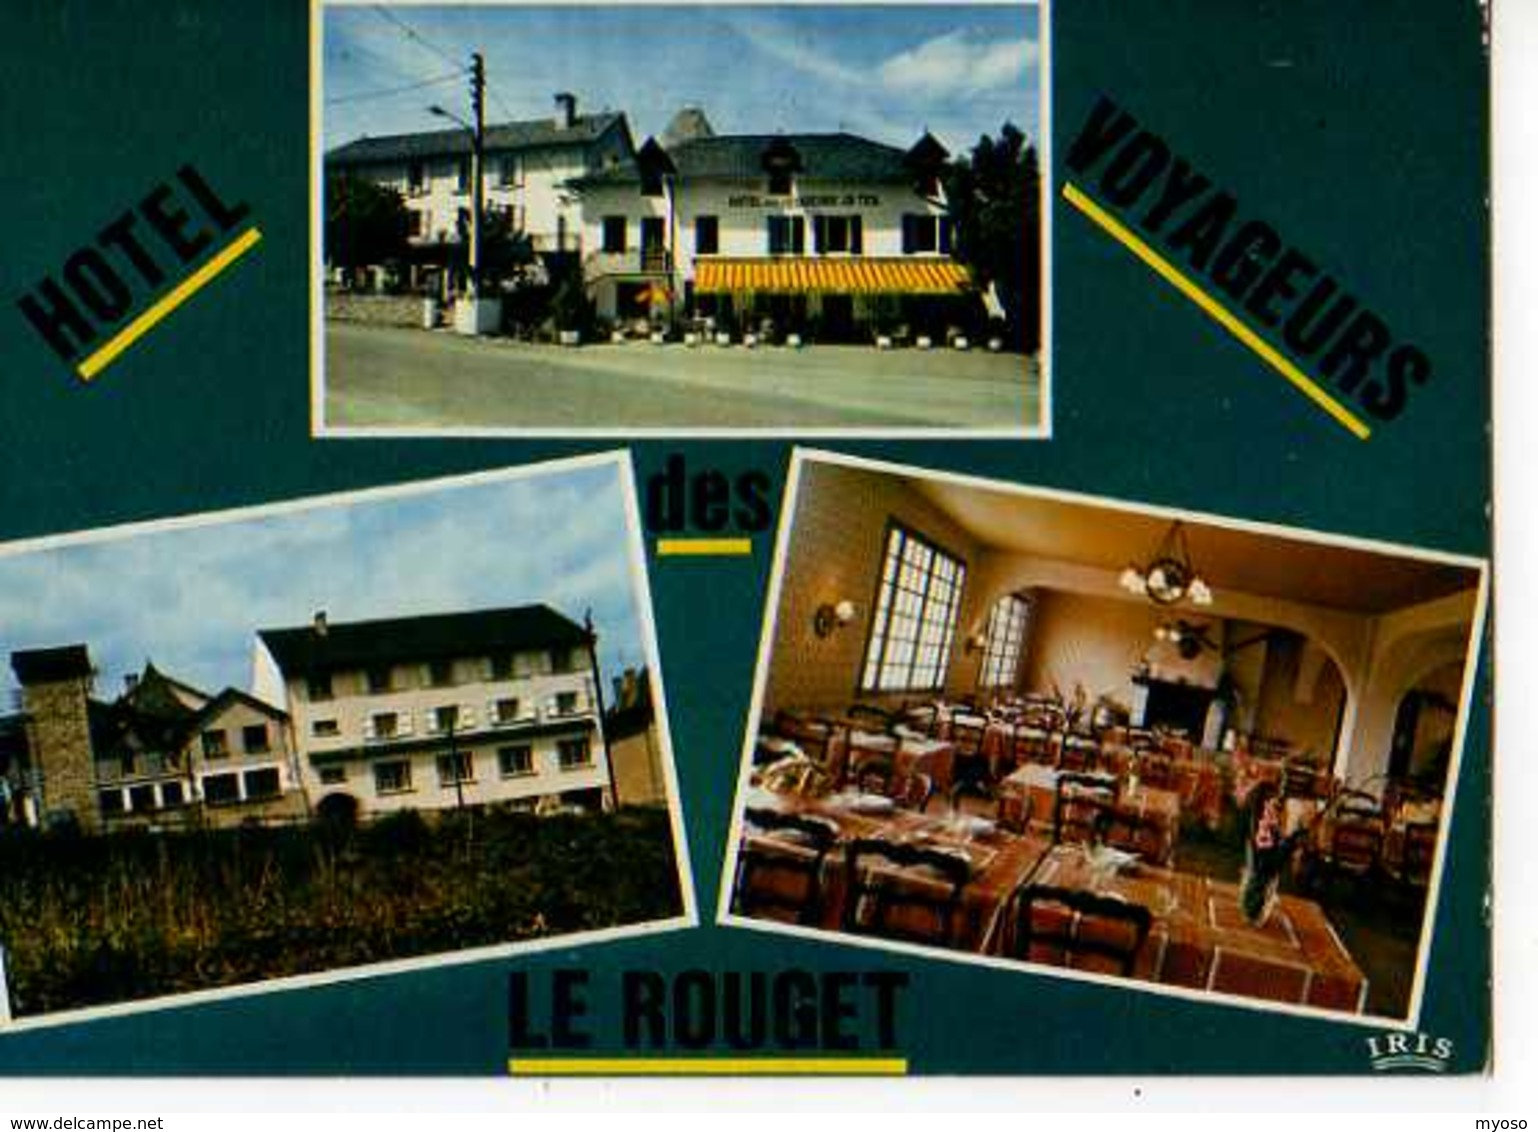 15 LE ROUGET Hotel Des Voyageurs - France